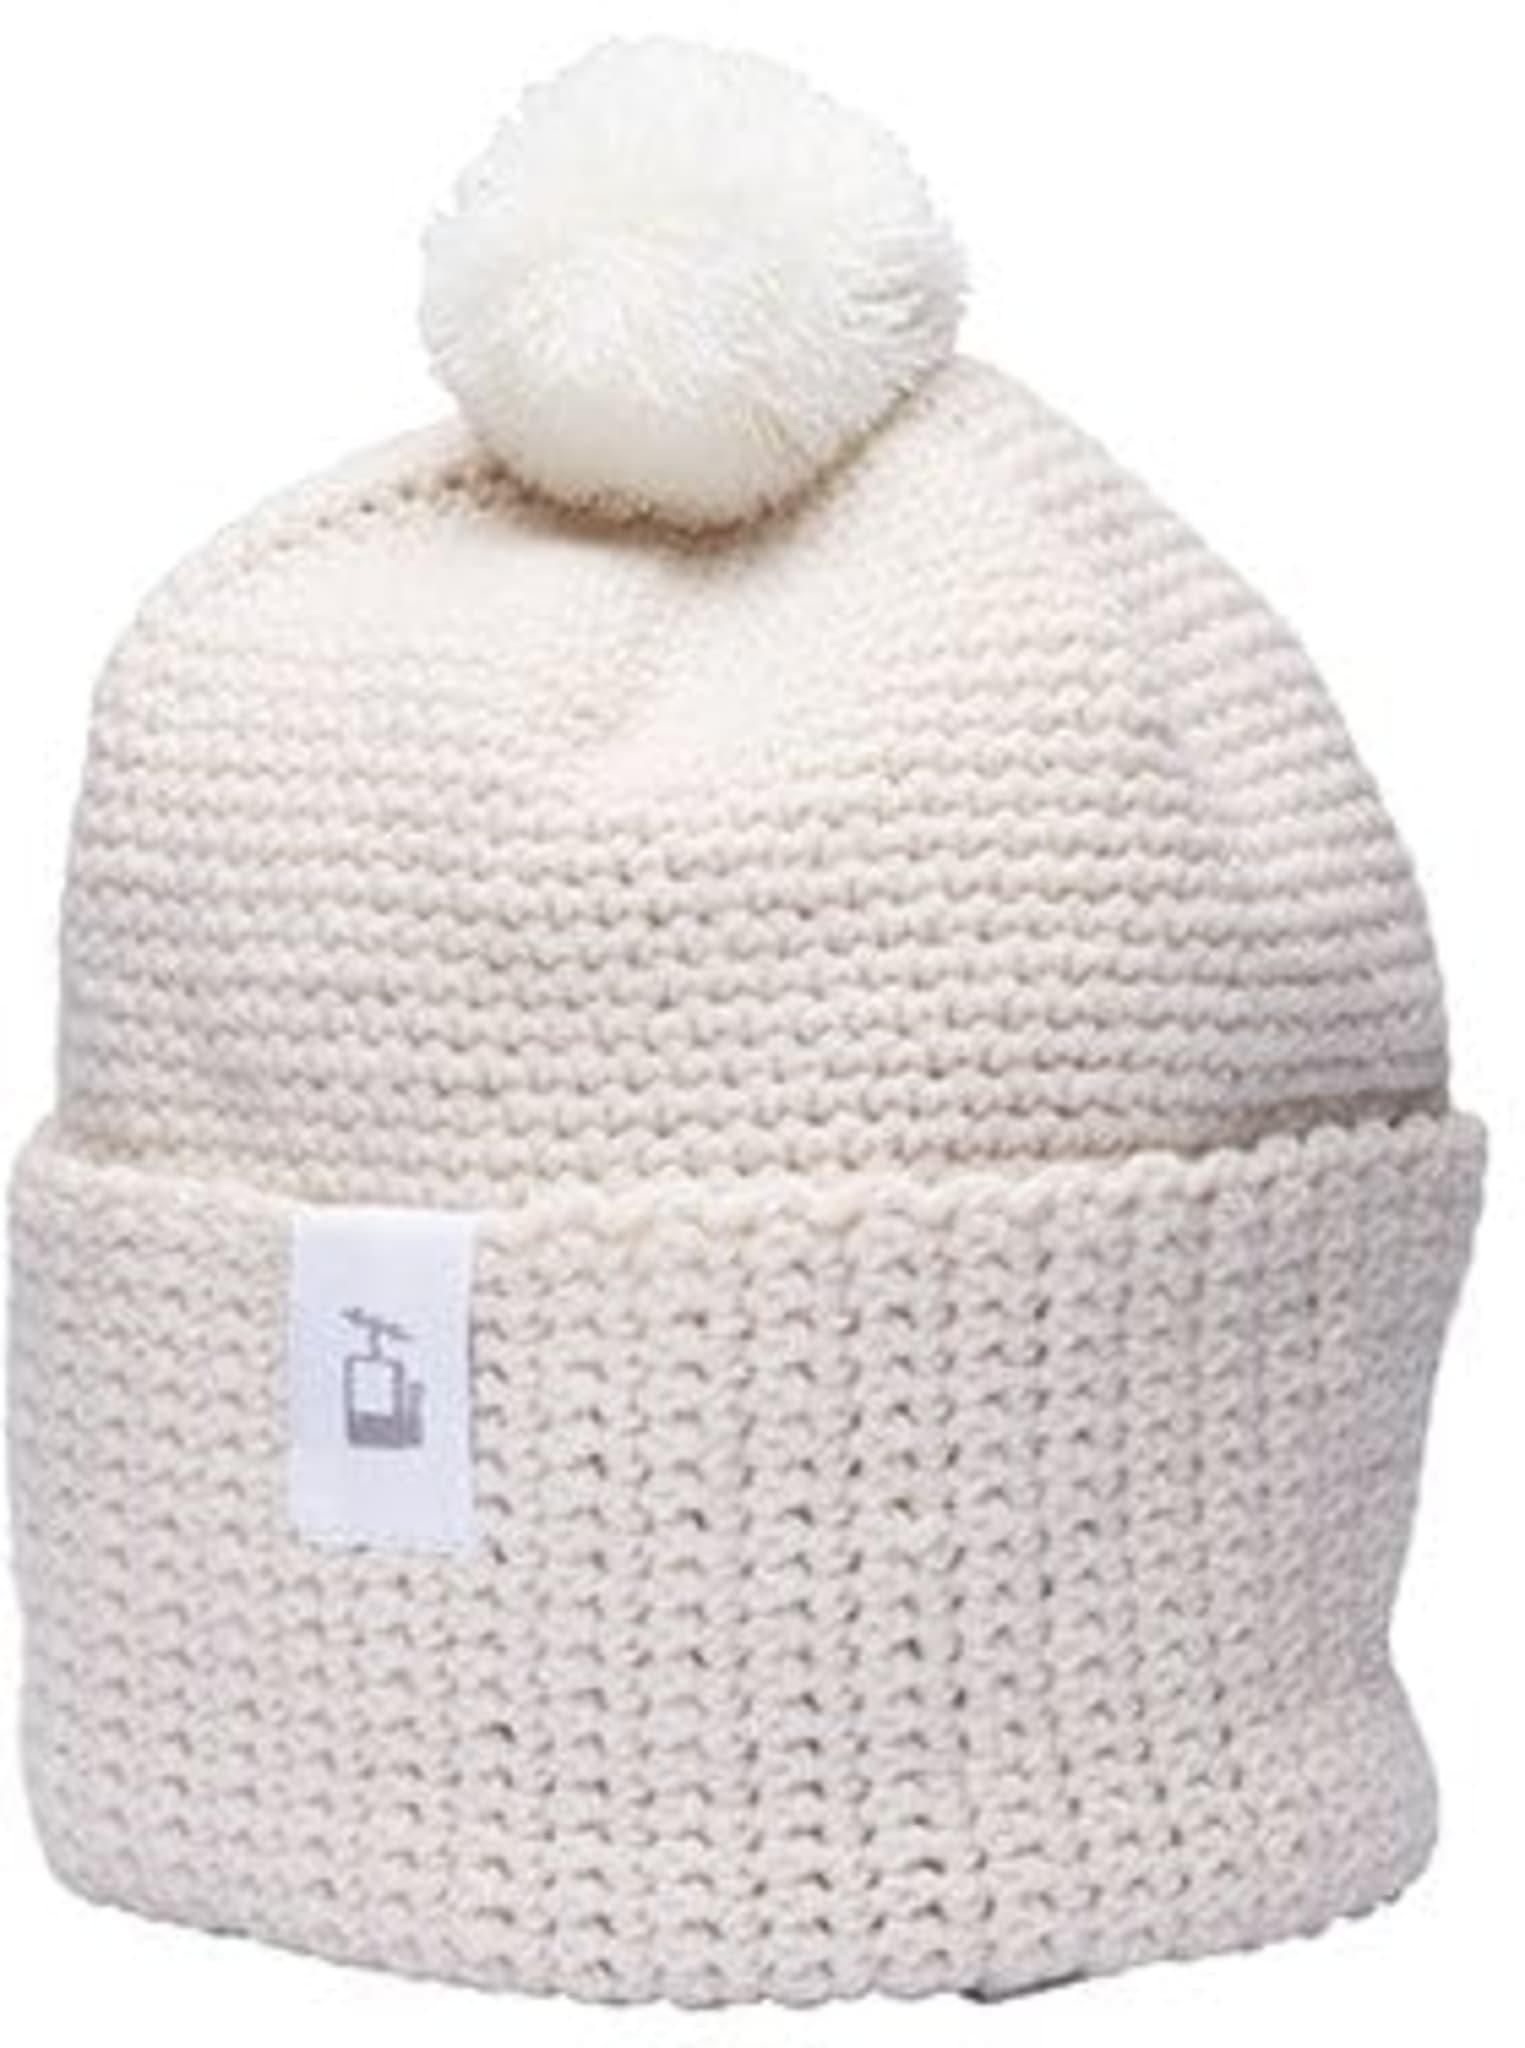 Folded Crochet Beanie